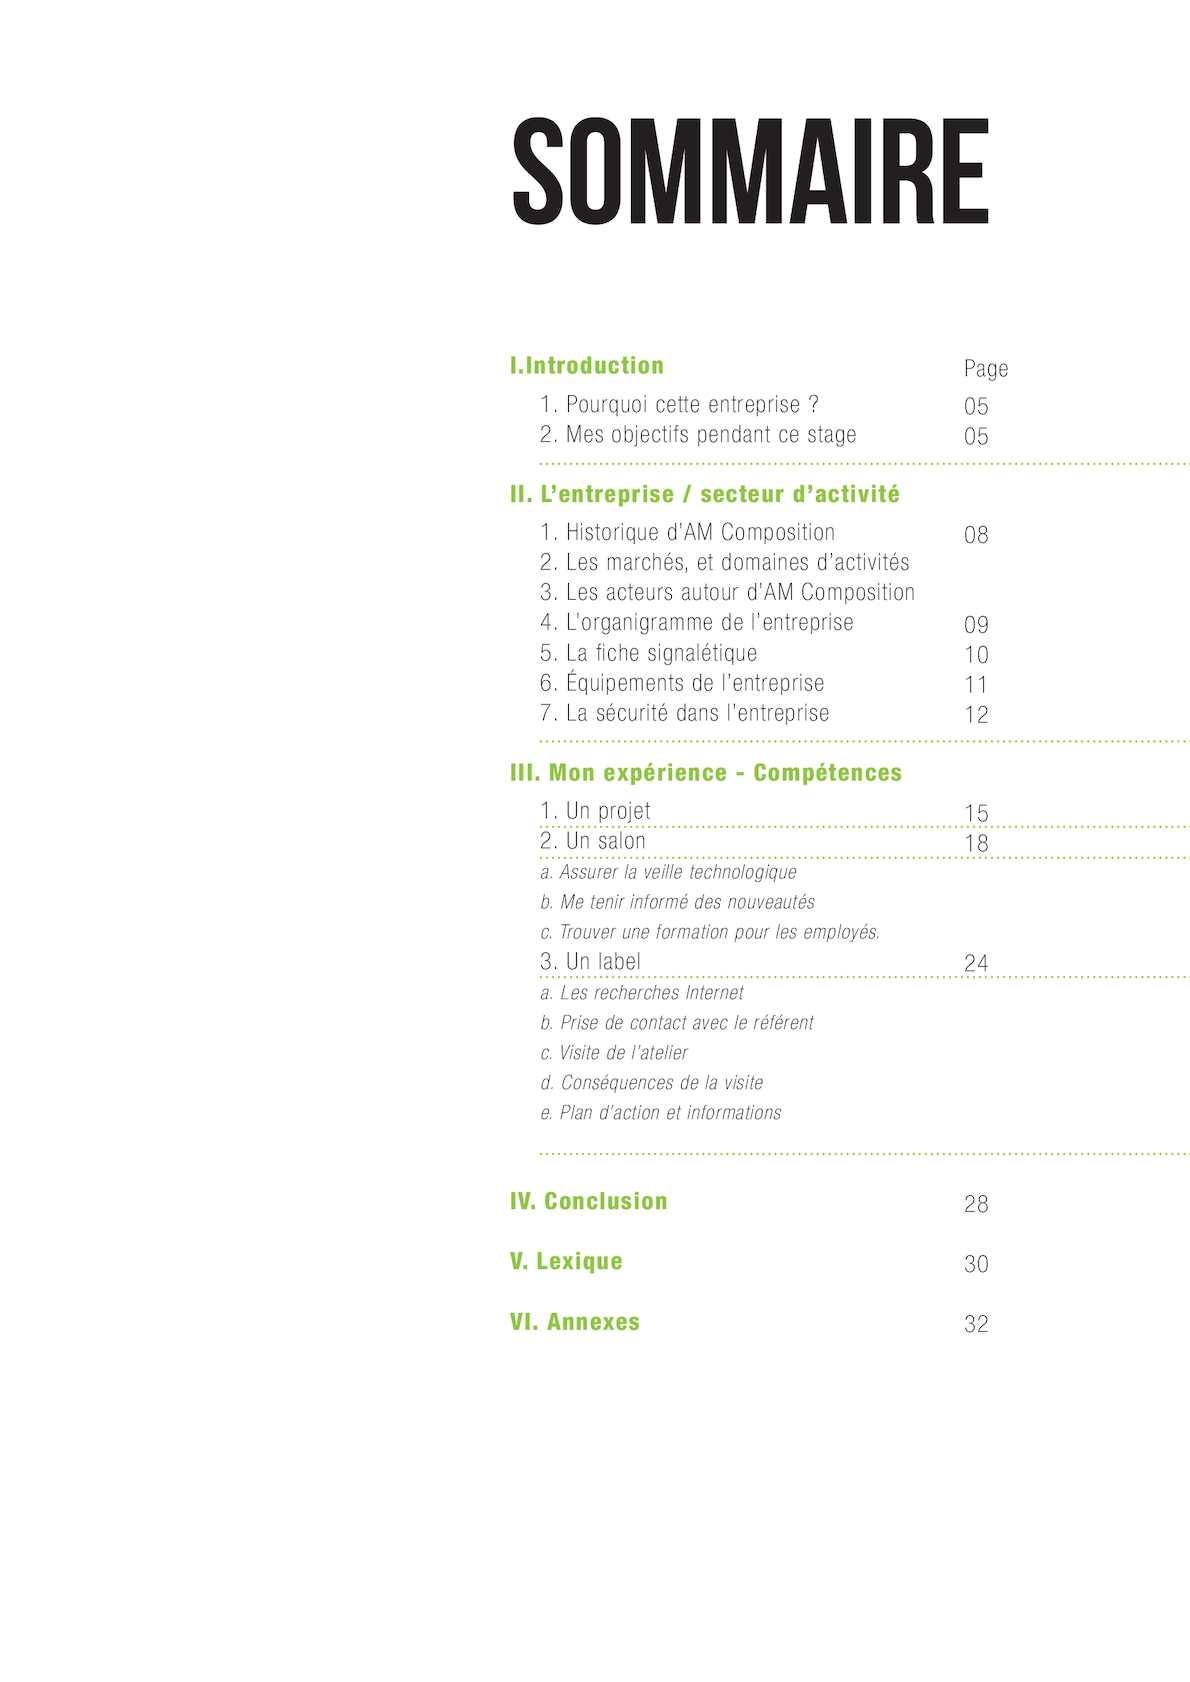 Rapport De Stage Cig Calameo Downloader